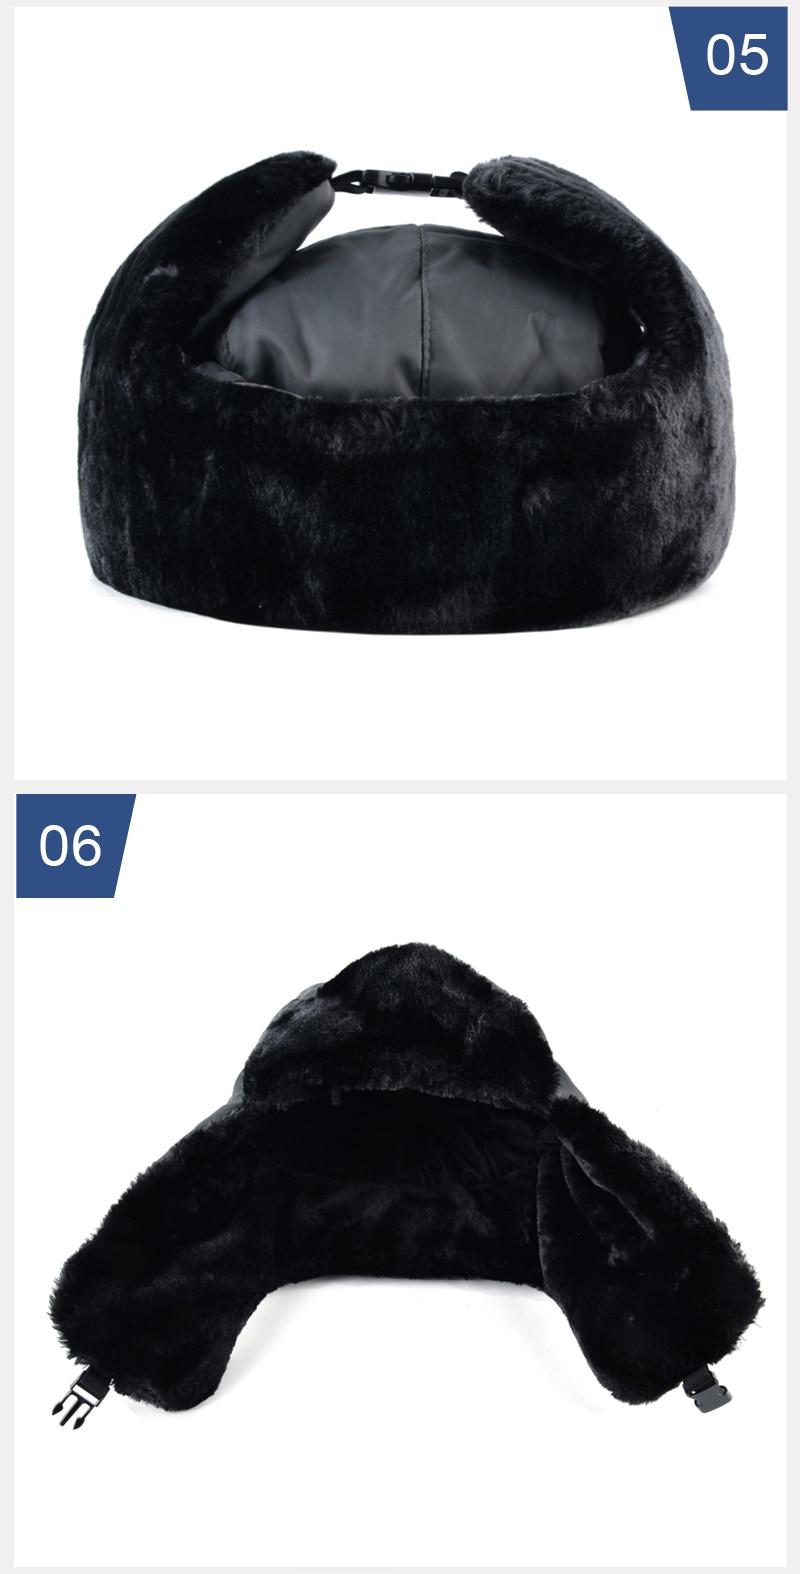 aa9b393c844 ... russian ushanka caps men. Style2   Winter hat bomber hats for men  thicken balaclava. 2 3 4 ...